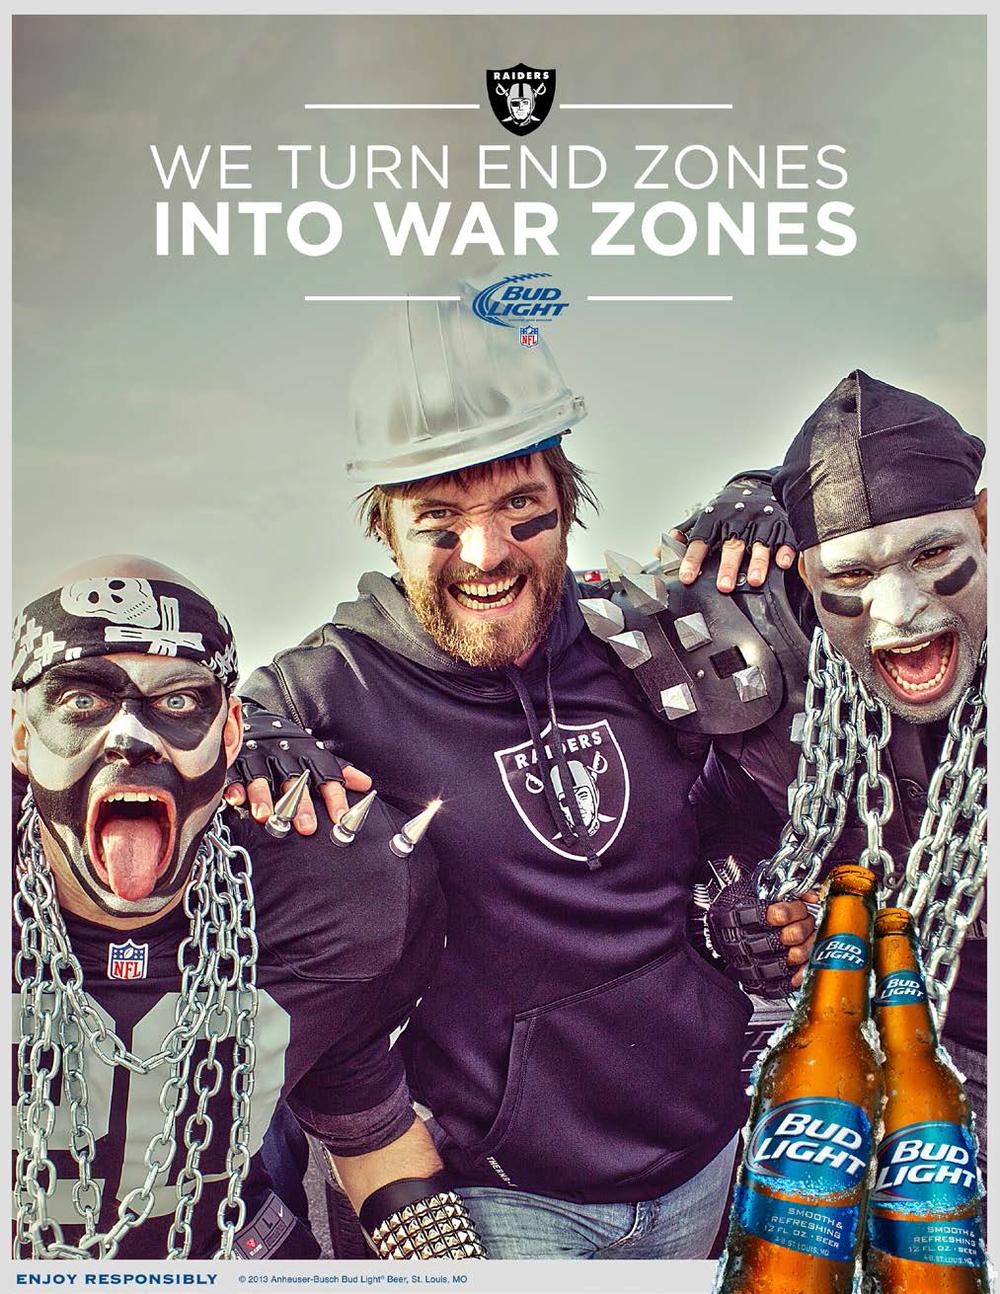 warzone.jpg